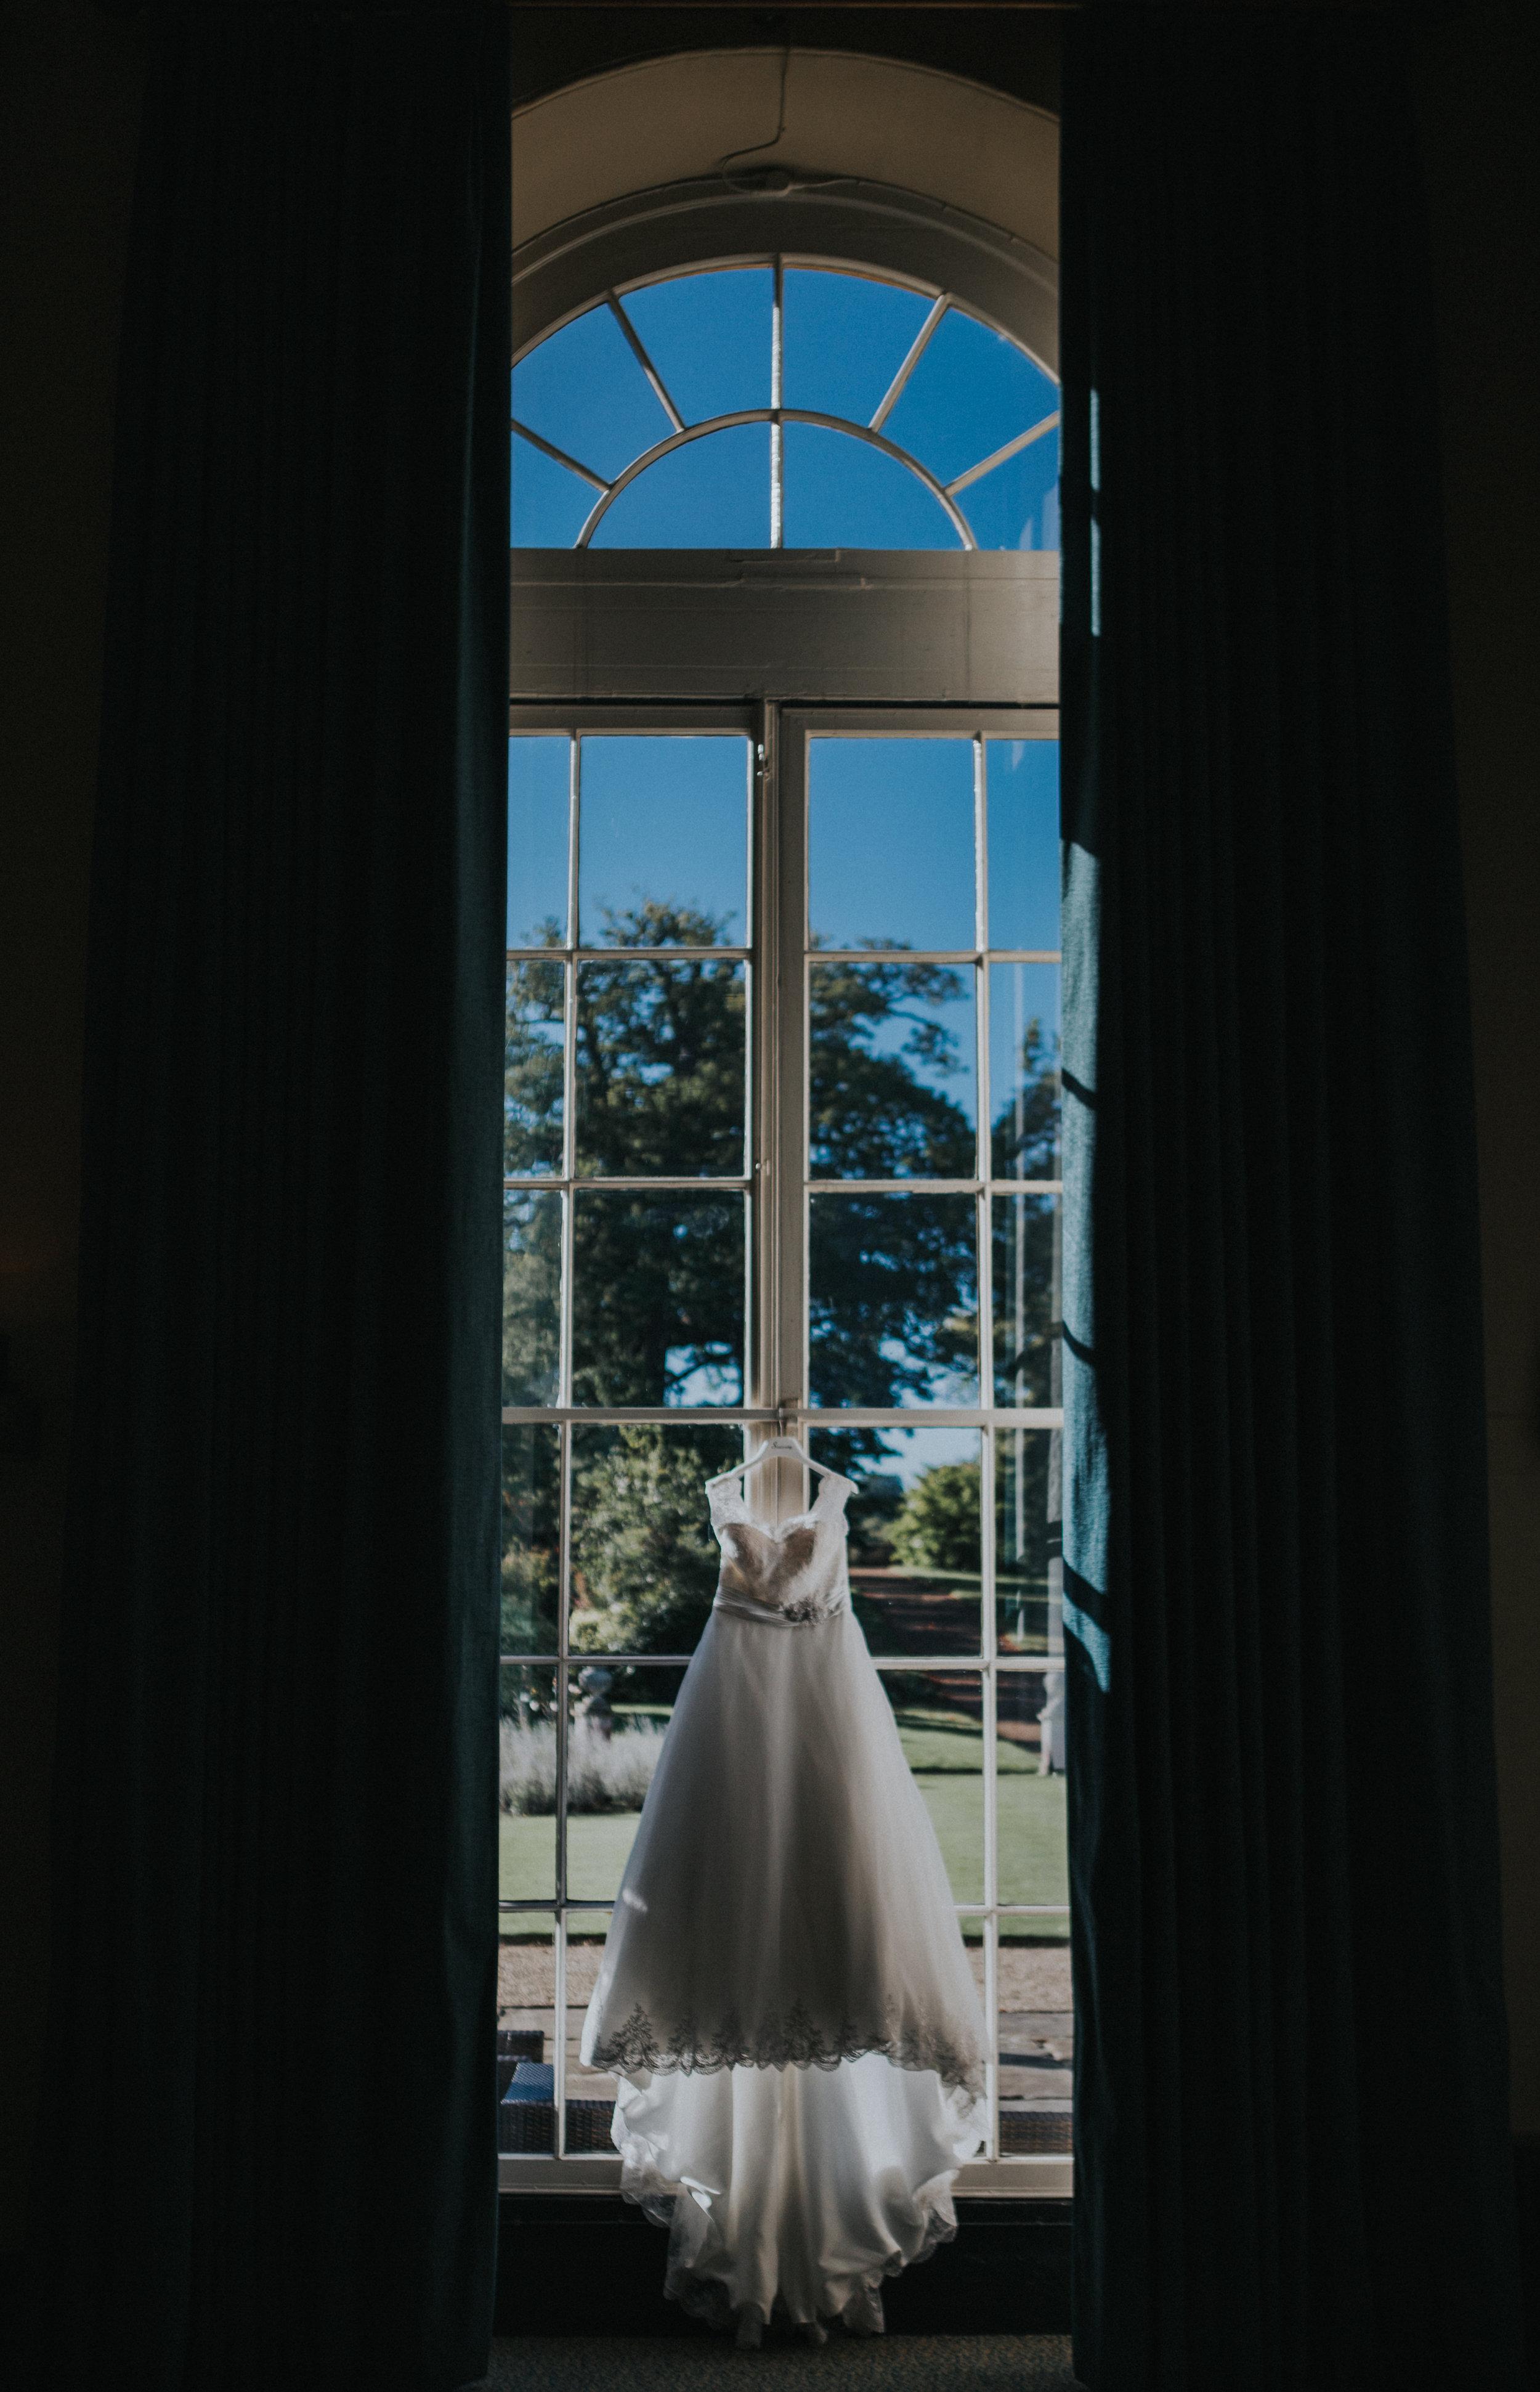 london-bedfordshire-uk-wedding-photography-woburn-scultpture-gallery-wedding-dress-03